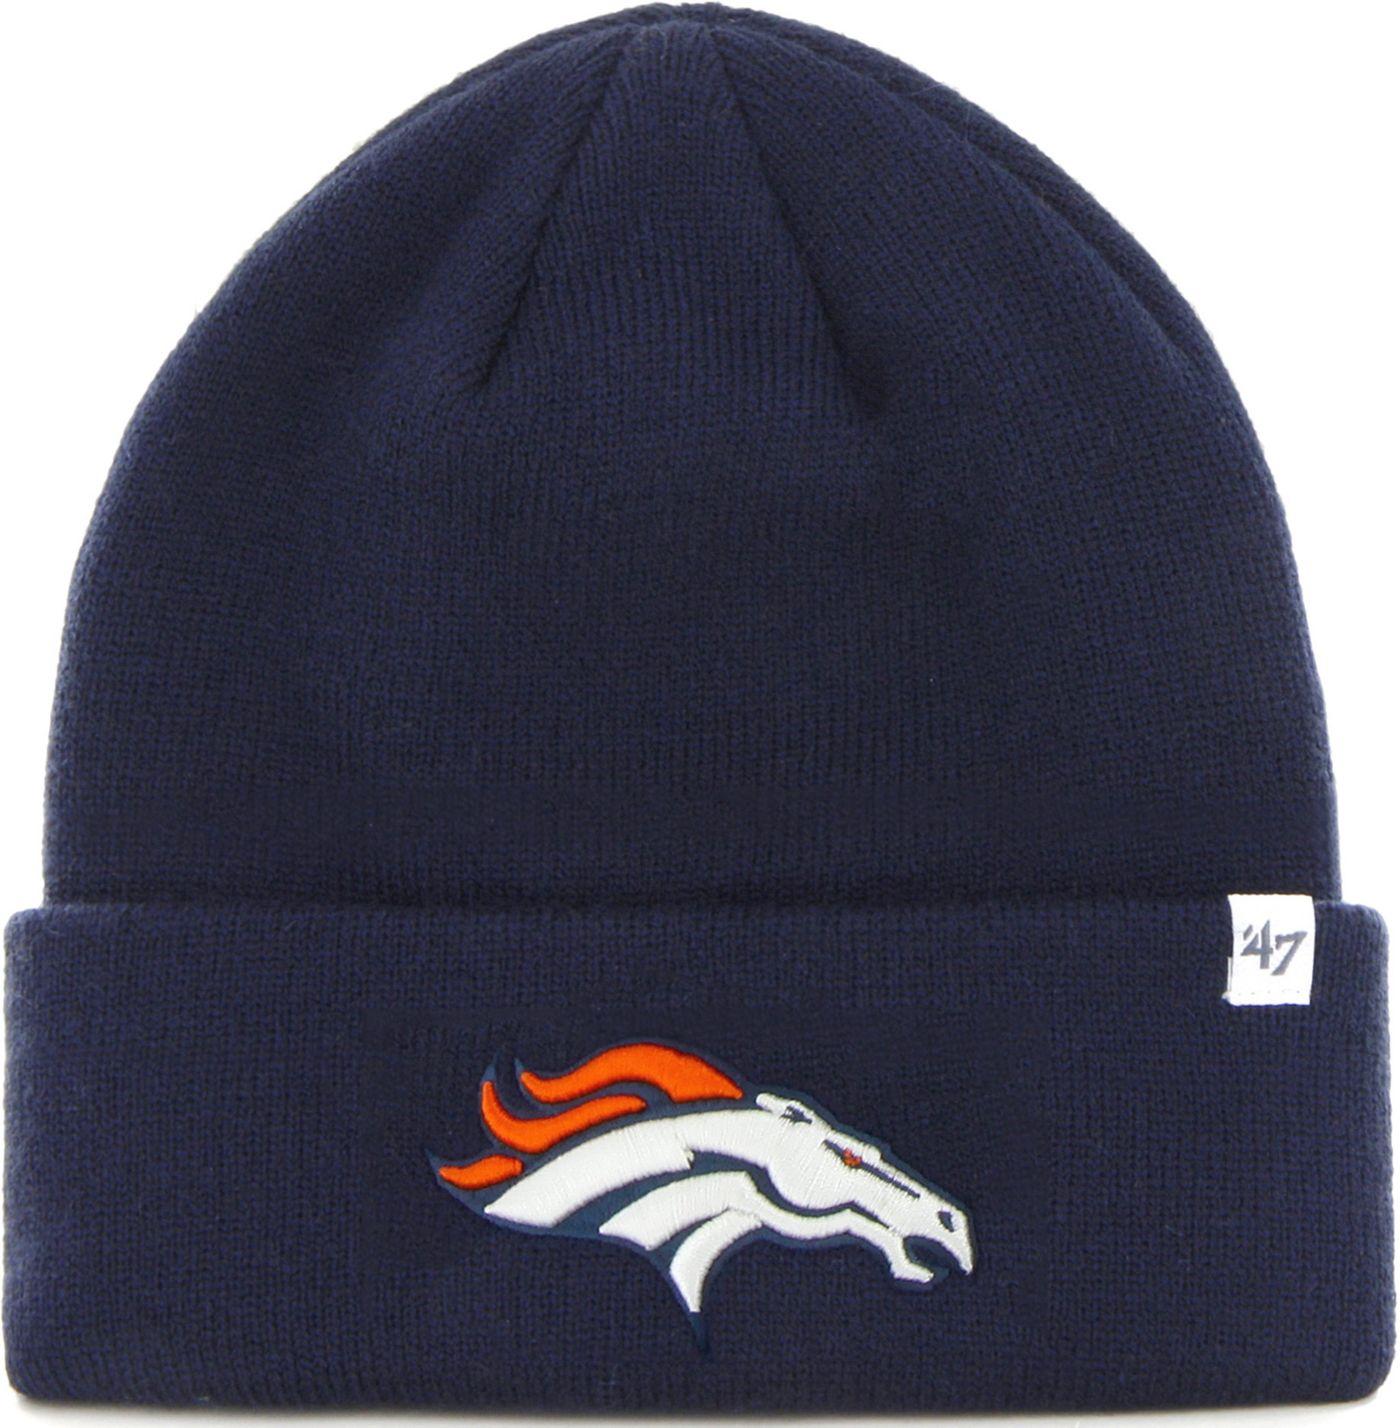 '47 Men's Denver Broncos Basic Navy Cuffed Knit Beanie